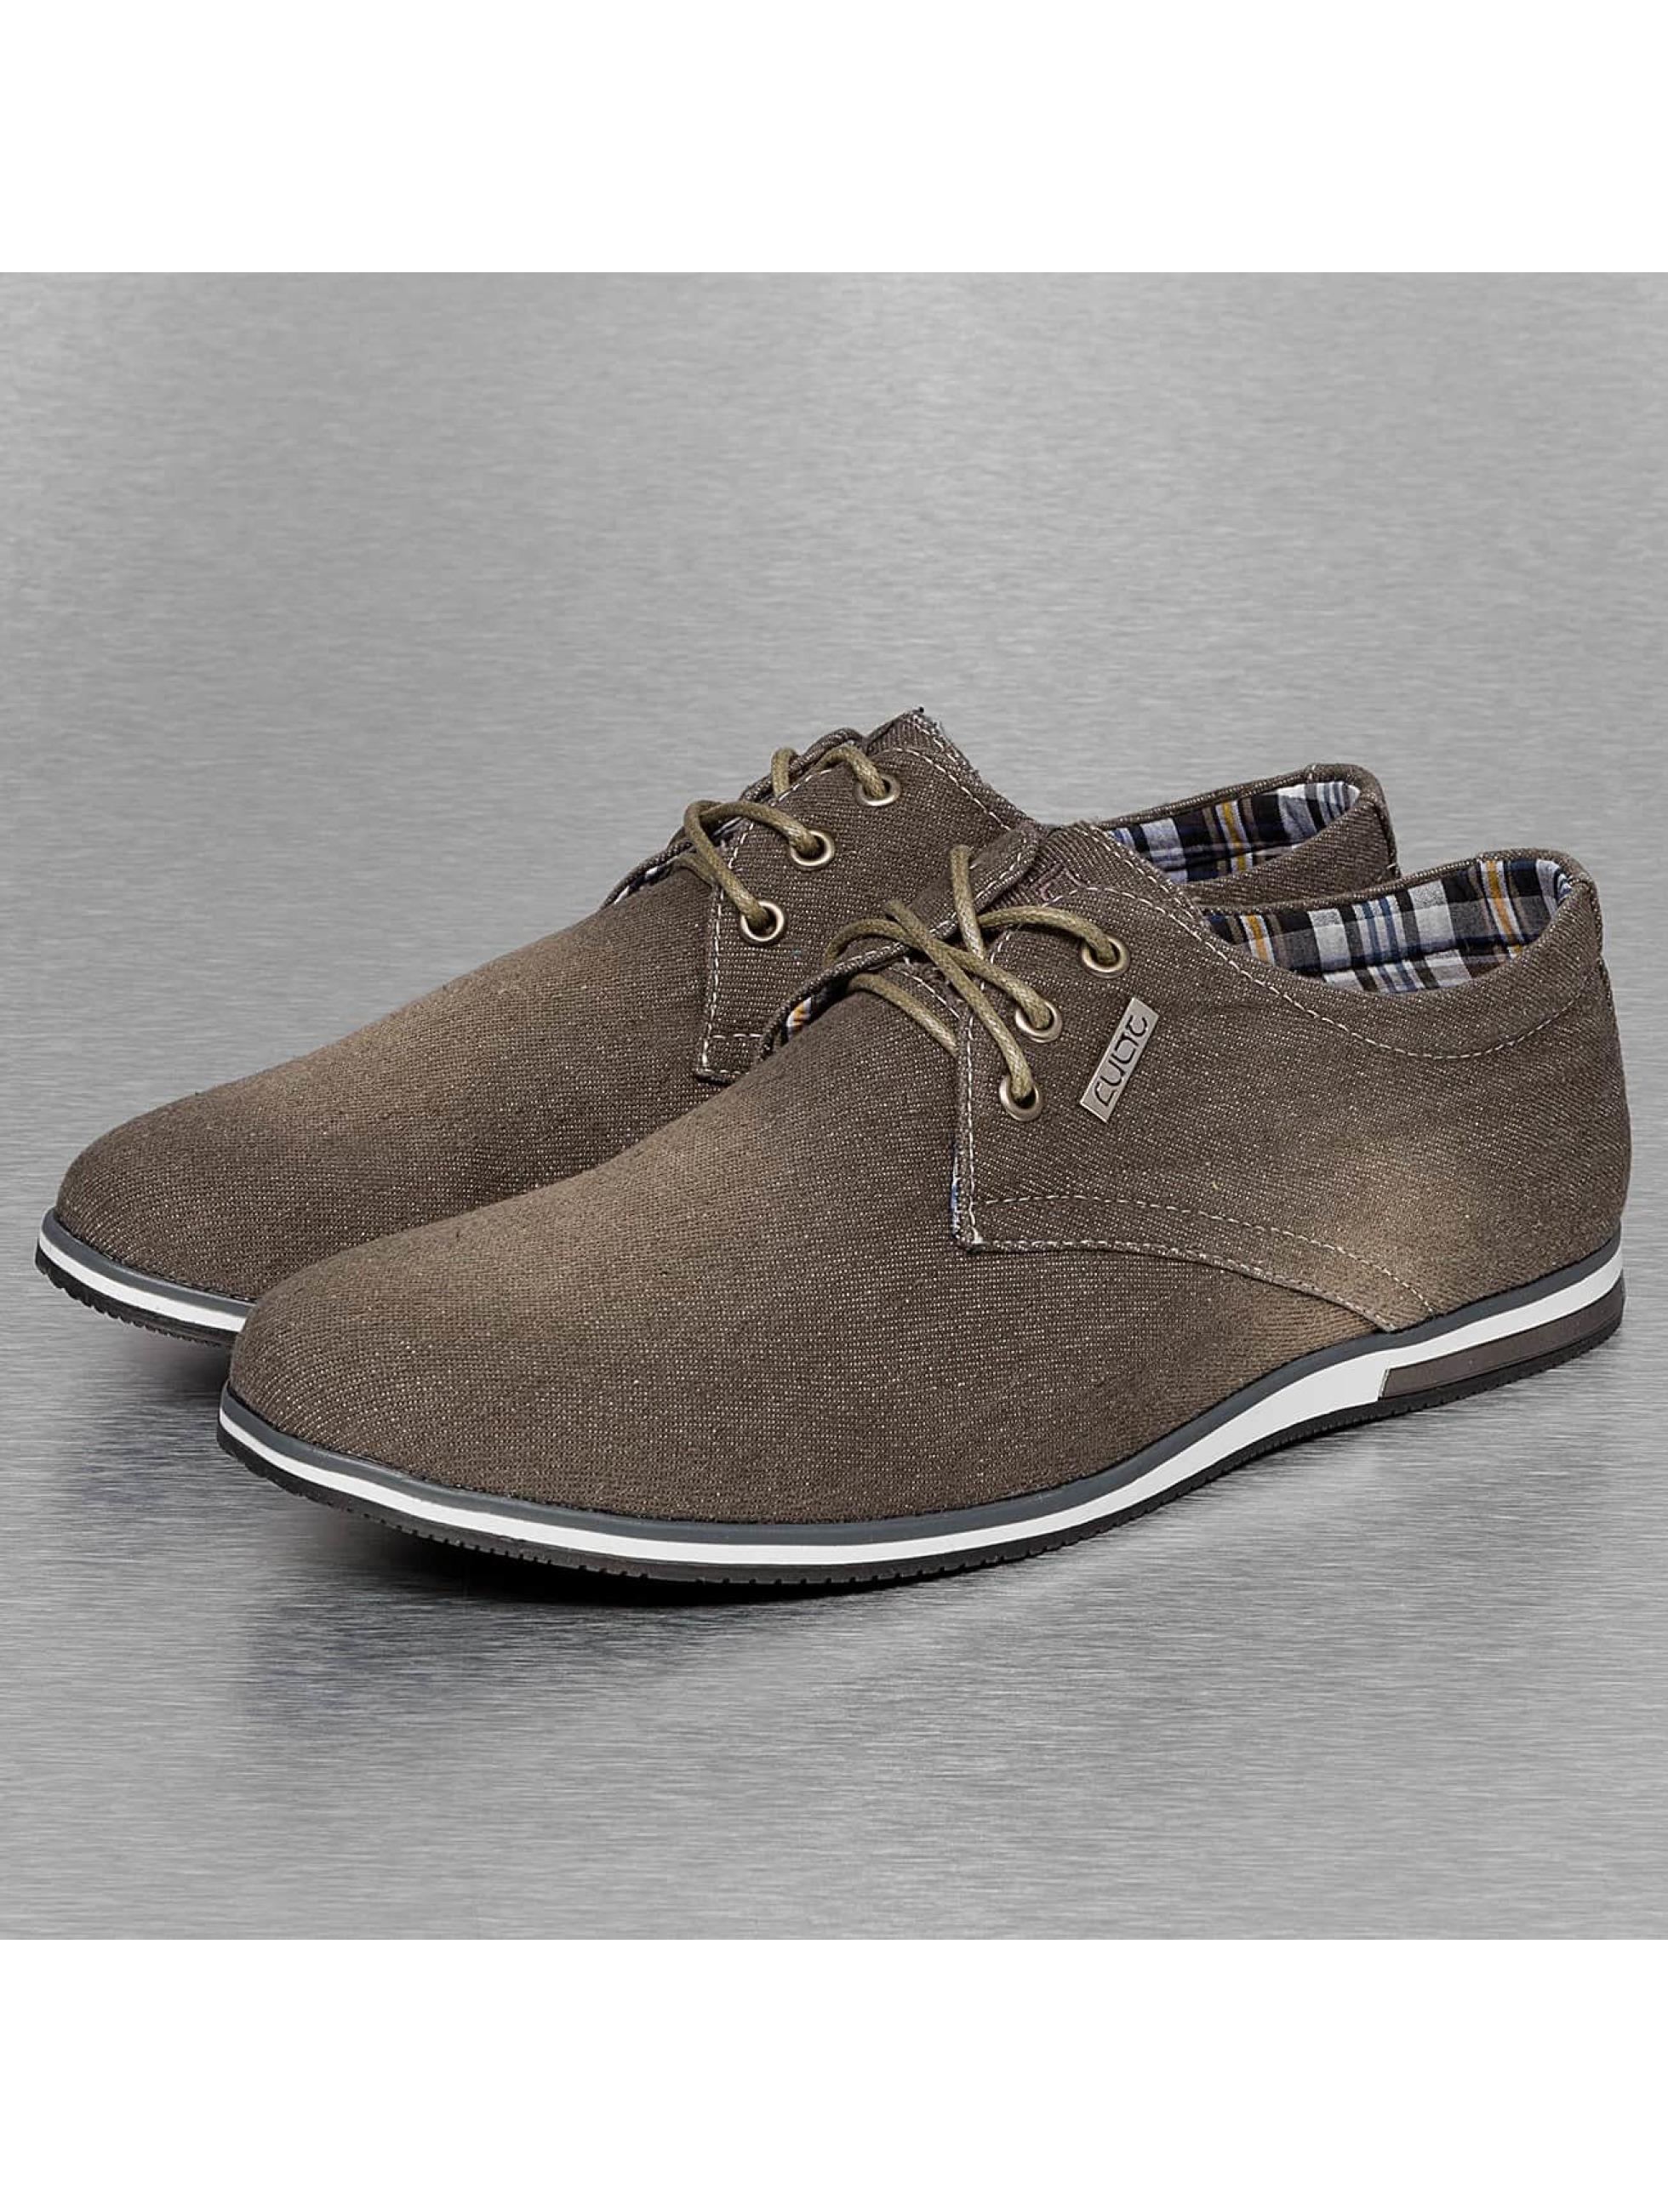 New York Style Sneaker Galway Denim khaki